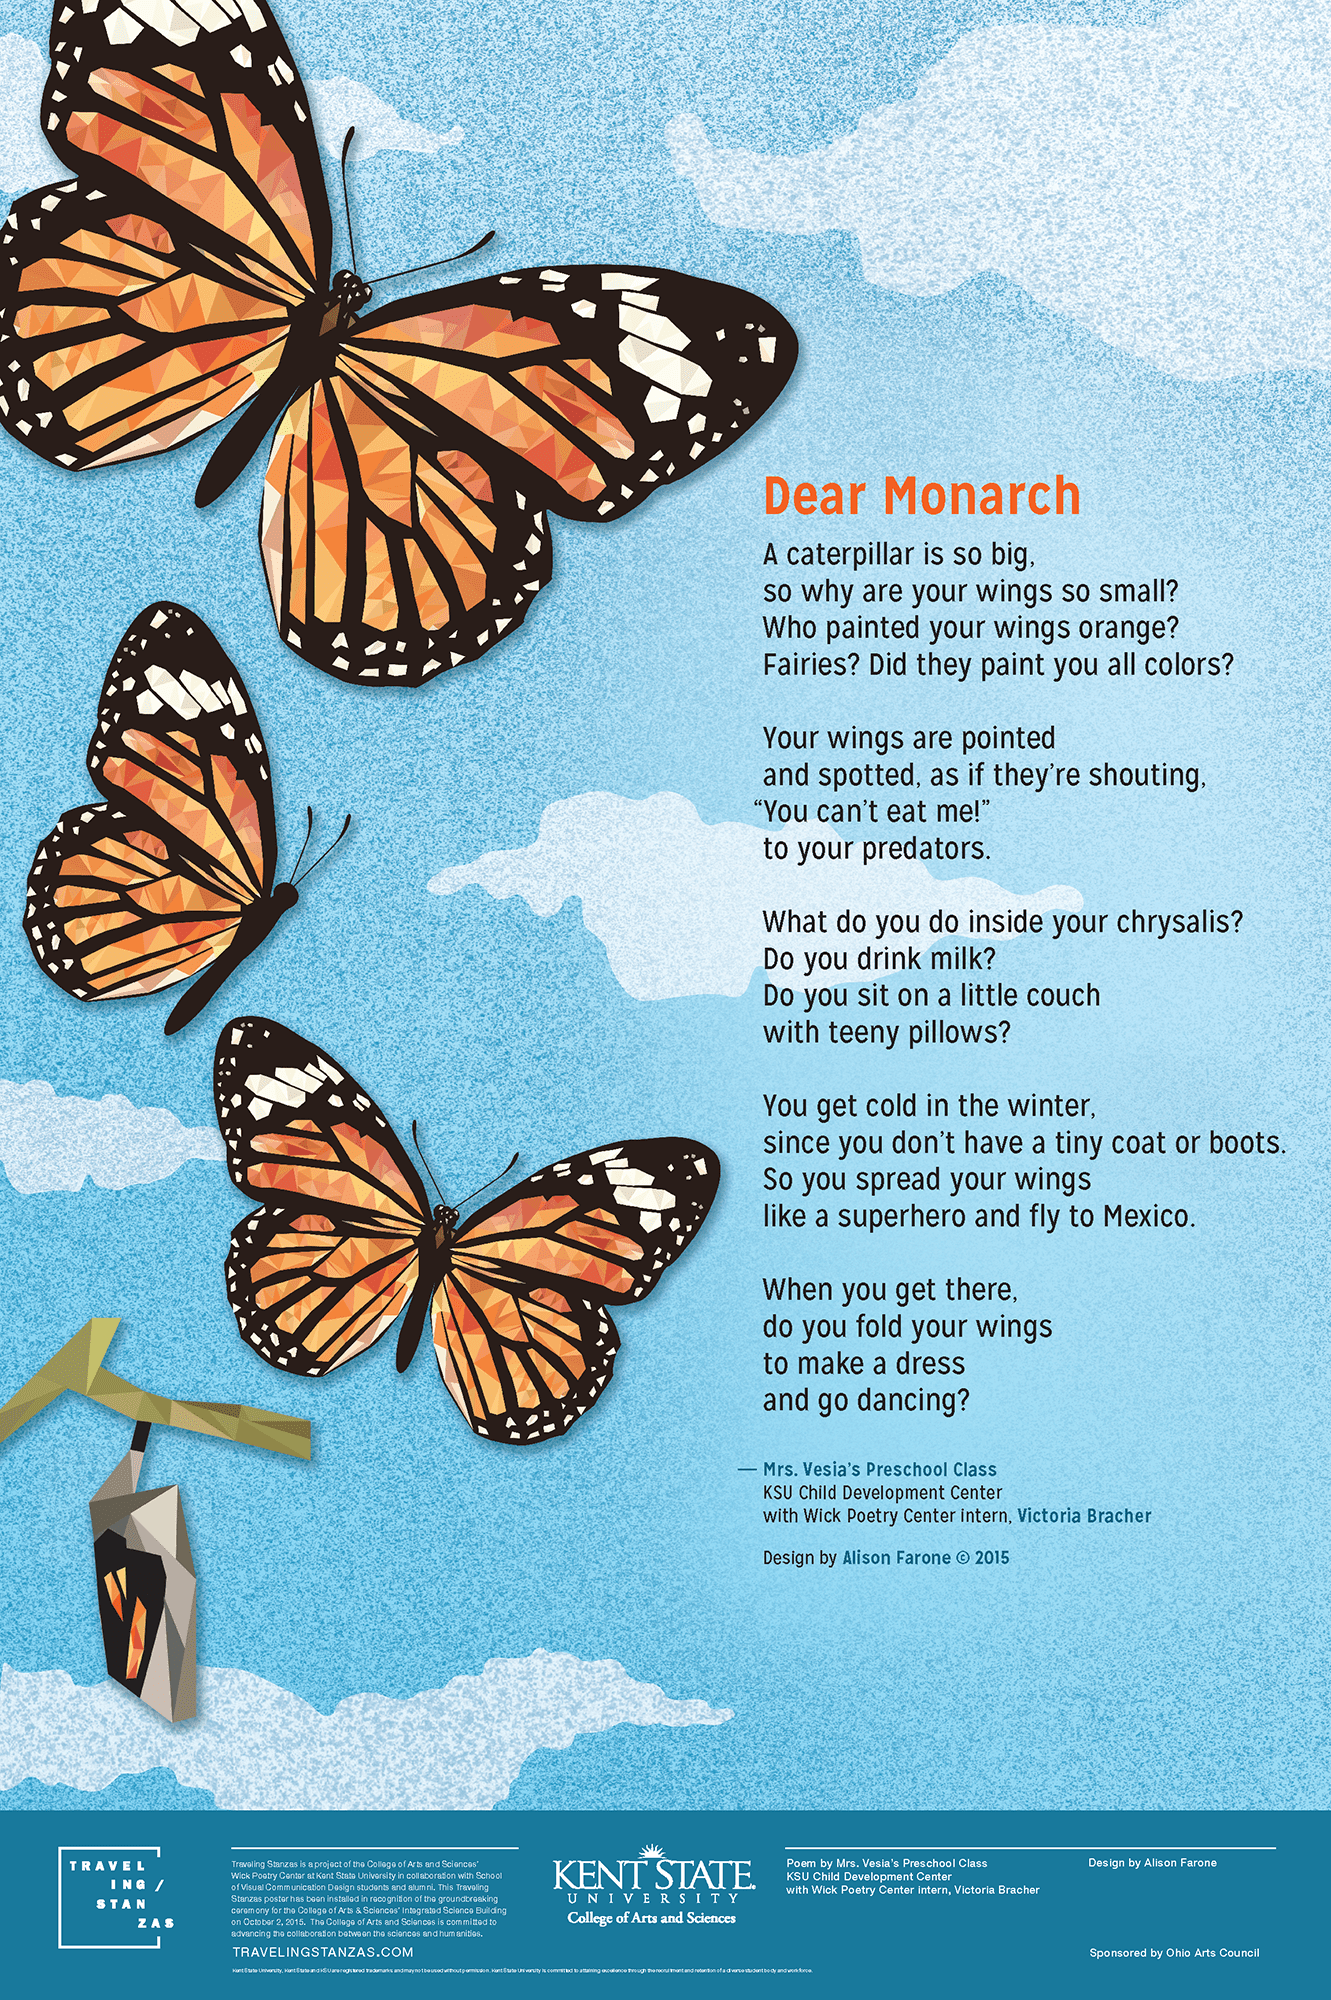 DearMonarch-VesiaClass-Poster